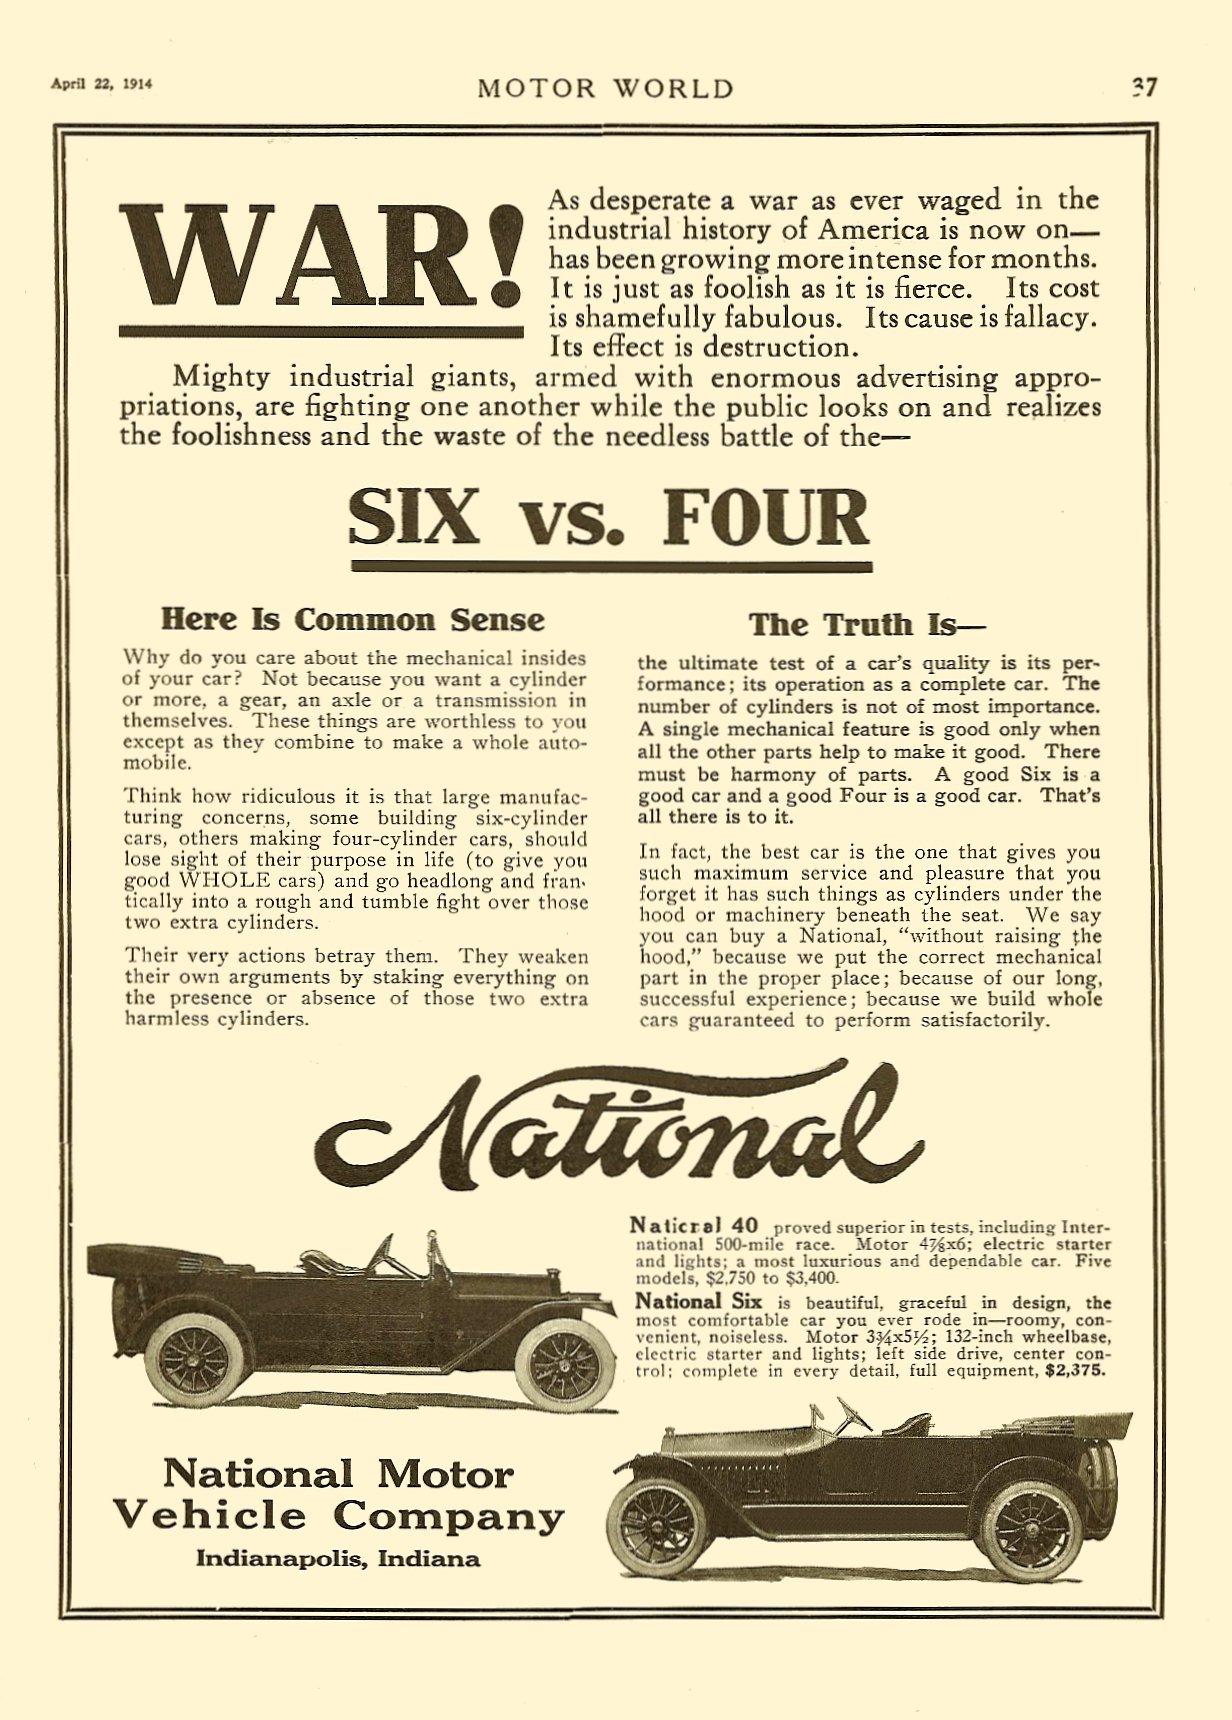 "1914 4 22 NATIONAL ""WAR! Six vs. Four"" MOTOR WORLD April 22, 1914 9″x12″ page 37"